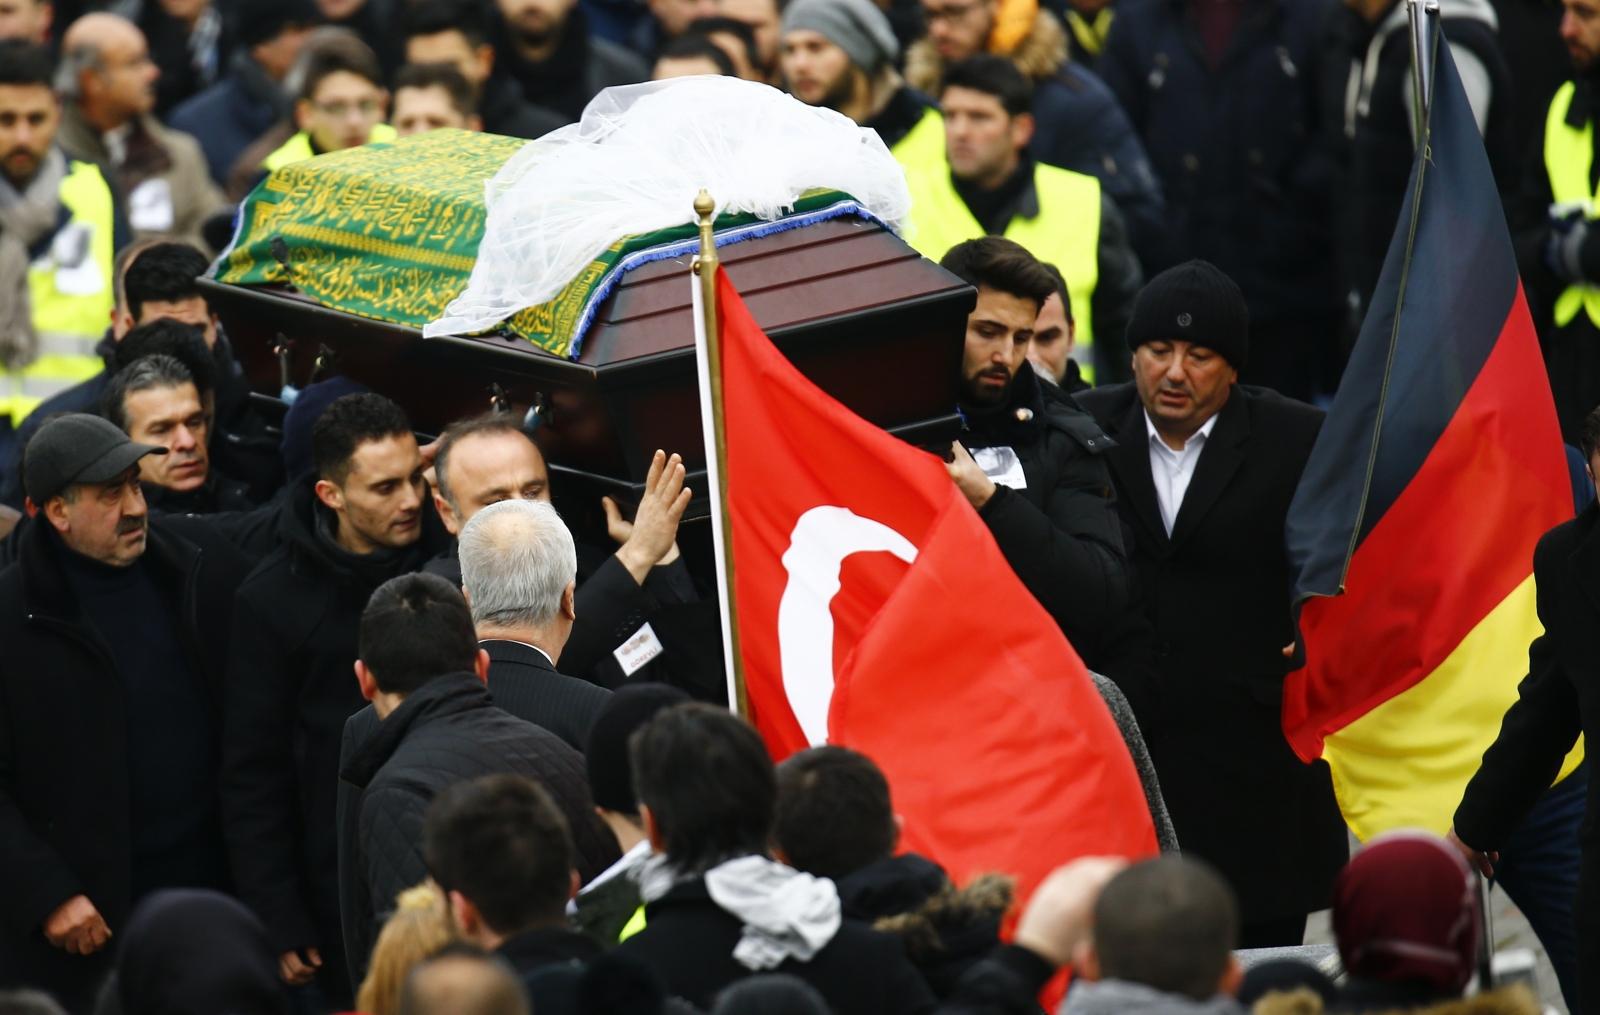 Tugce Albayrak Funerals McDonald's attack Germany